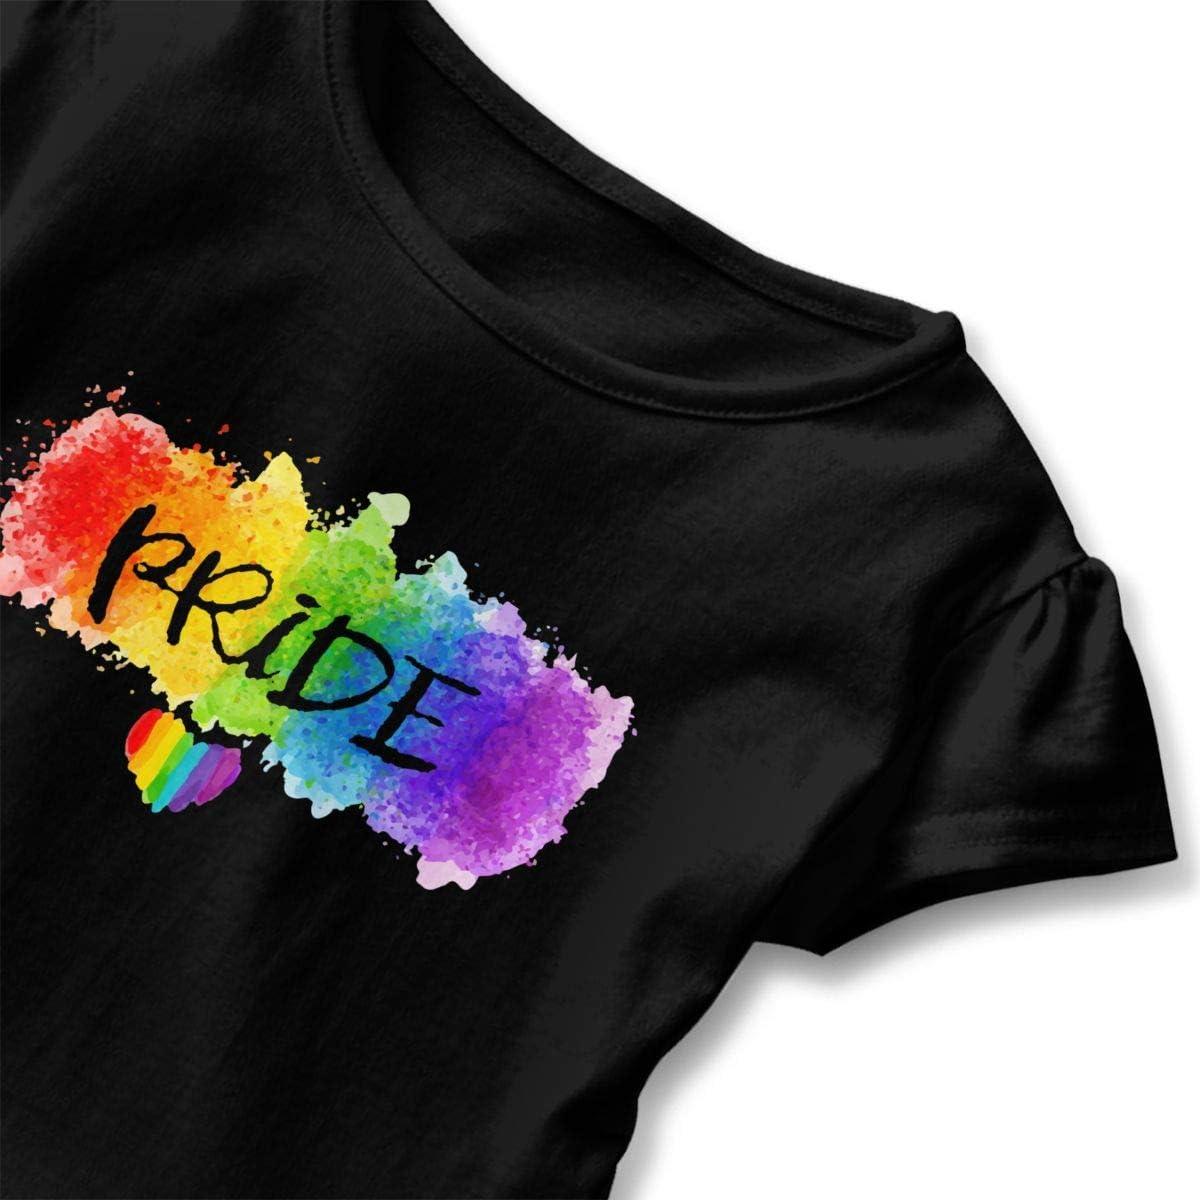 26NSHIRT LGBT Pride Baby Girls Short Sleeve Cotton T-Shirts